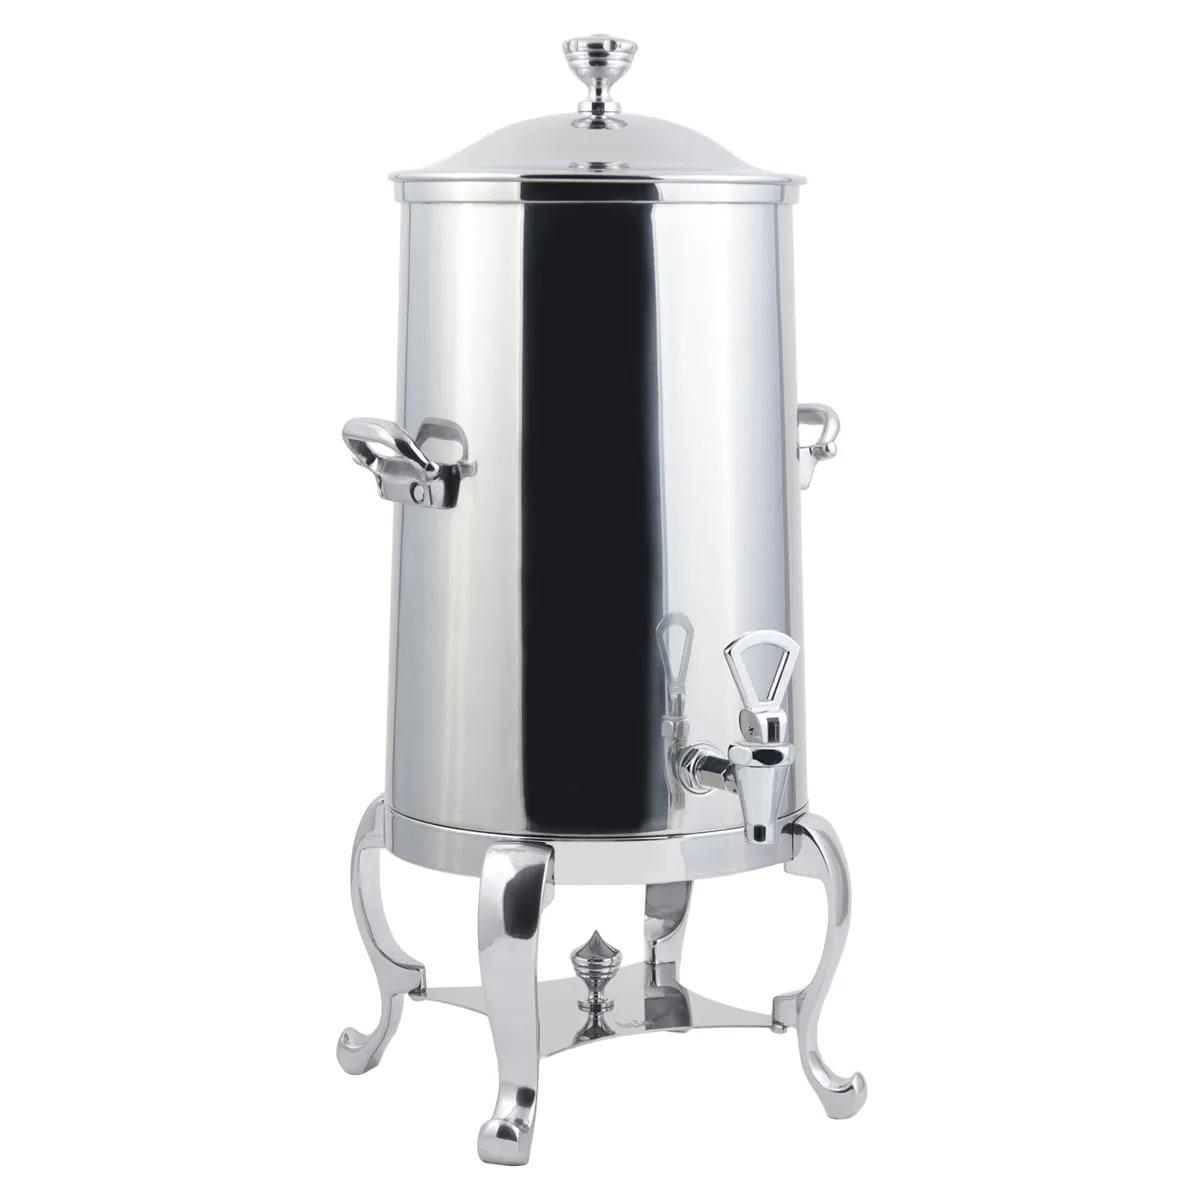 Bon Chef 49005C 5 gal Insulated Coffee Urn Server, Chrome, Roman